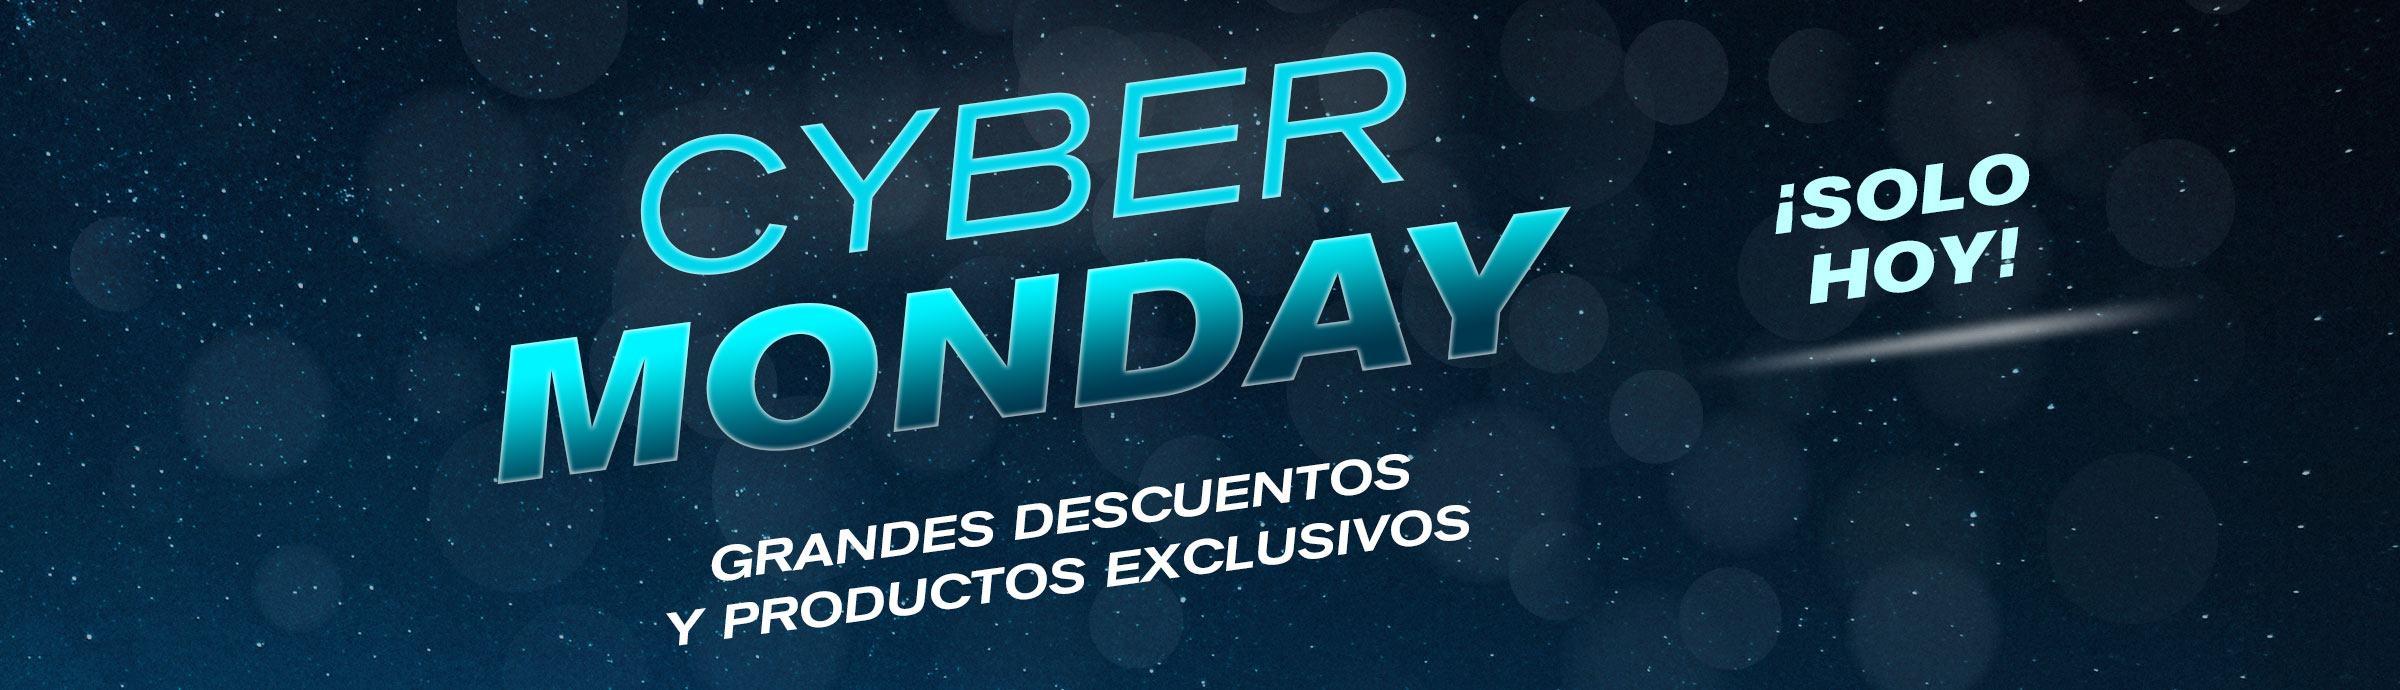 Cyber Monday Juguetes 2020